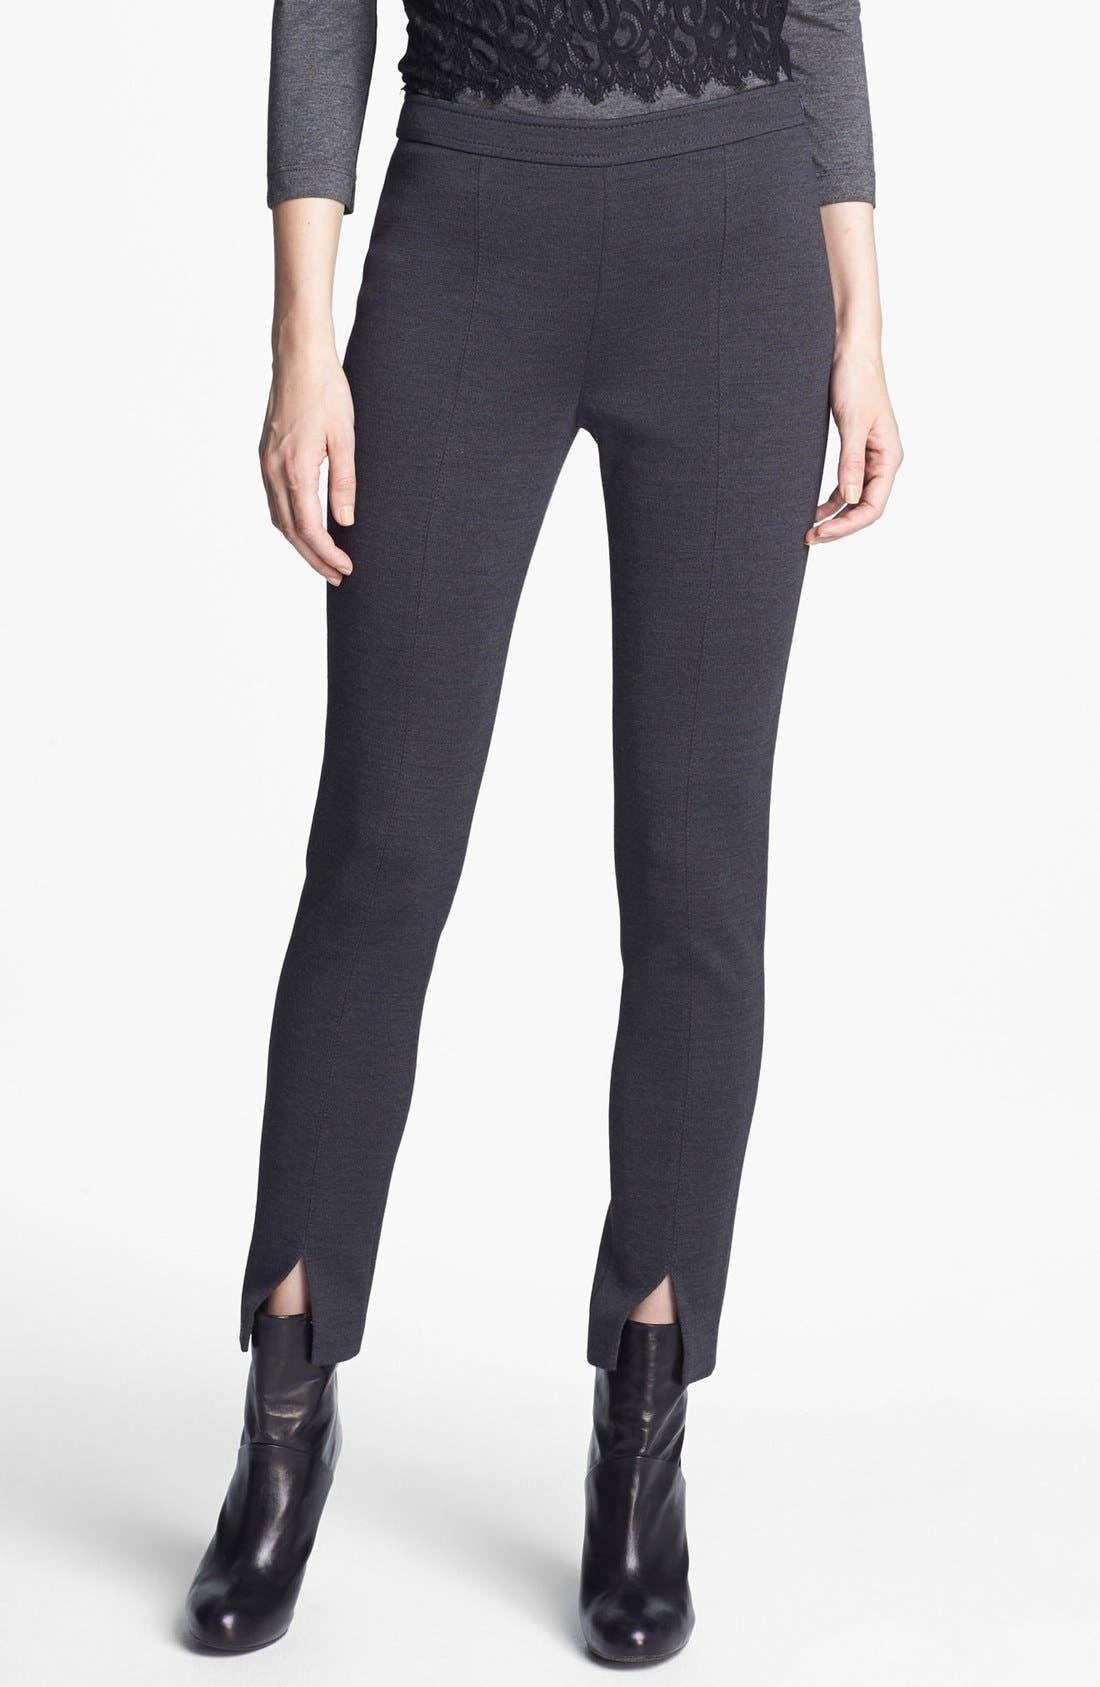 Main Image - St. John Collection 'Jennifer' Slim Milano Knit Pants